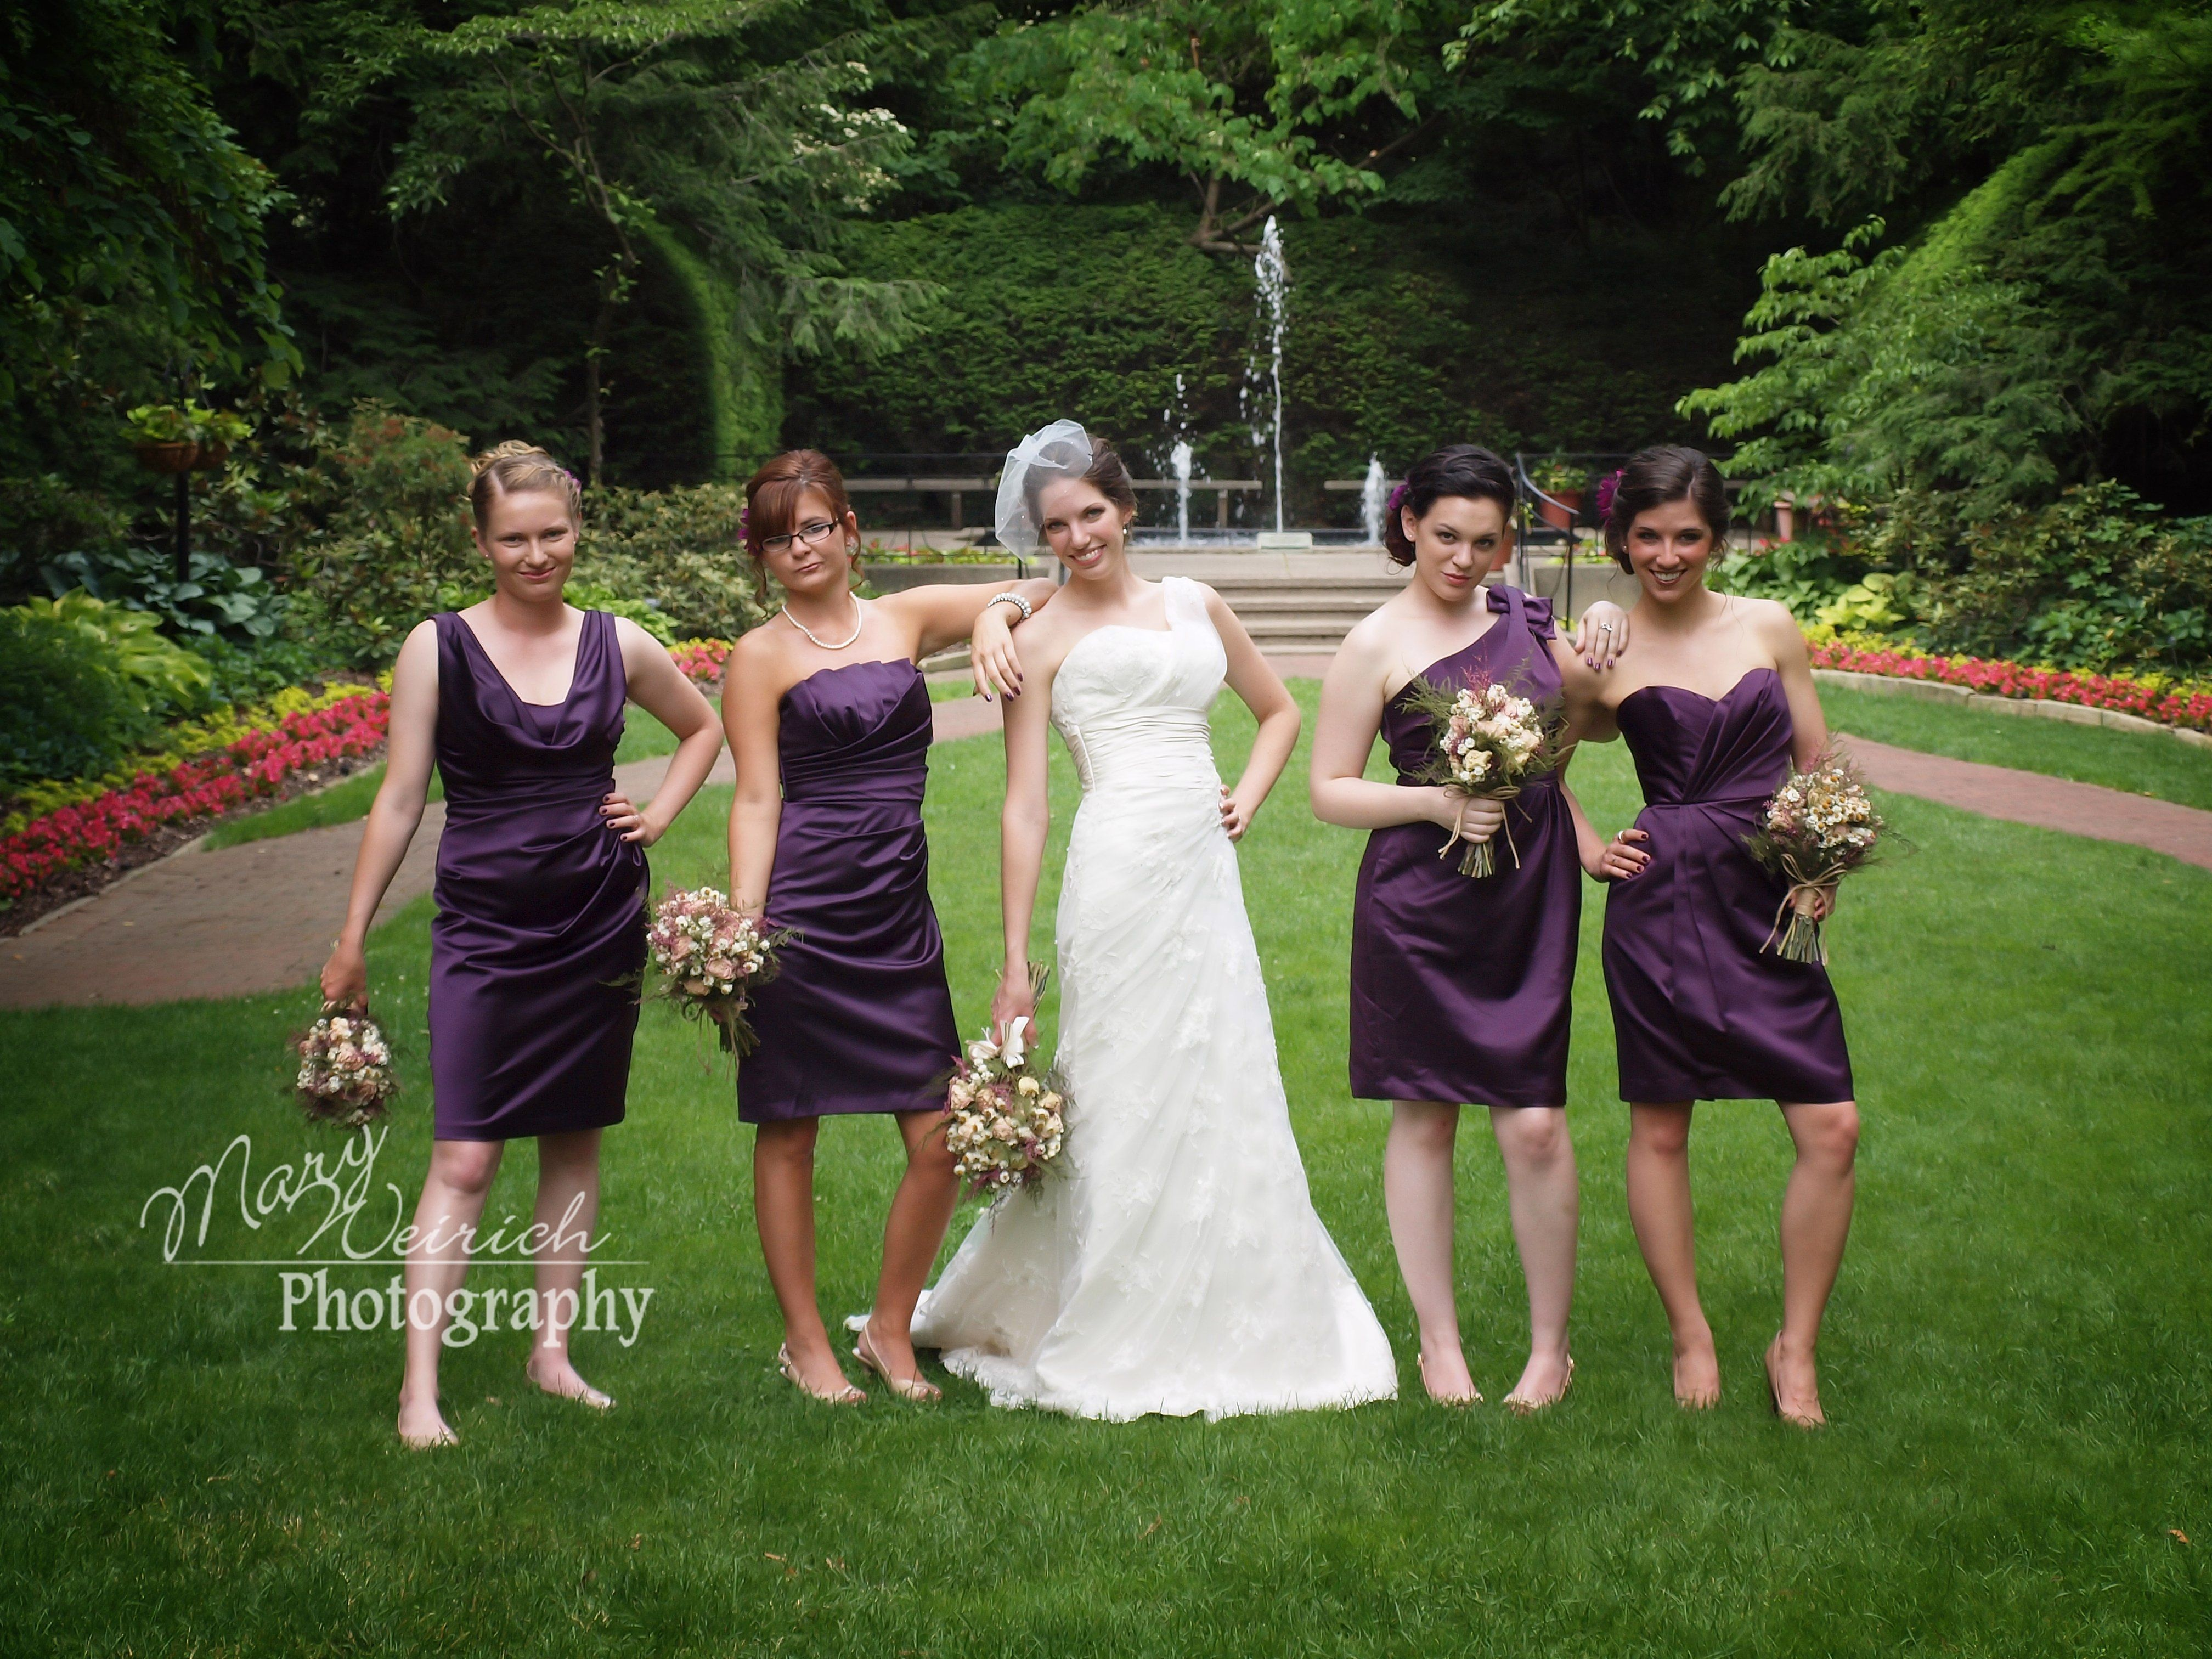 Dark purple bridesmaids dresses fun wedding pose kingwood dark purple bridesmaids dresses fun wedding pose kingwood center wedding outdoor wedding ombrellifo Image collections